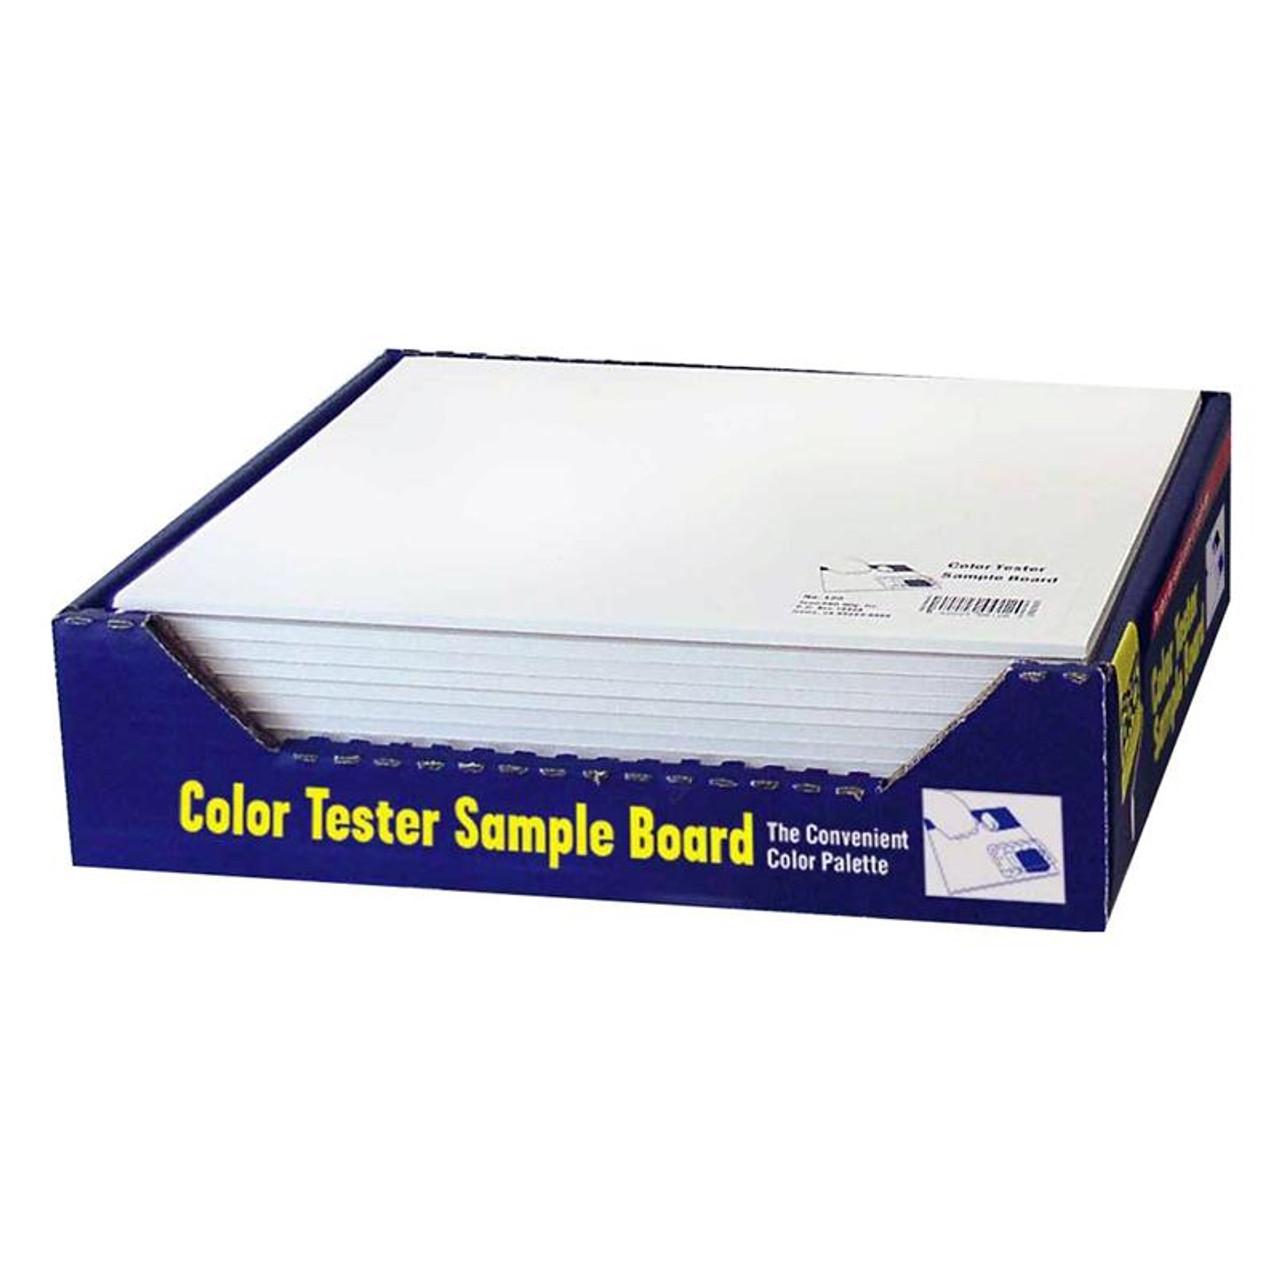 "FoamPro Color Tester Sample Board 10"" x 12"" Pack of 24"